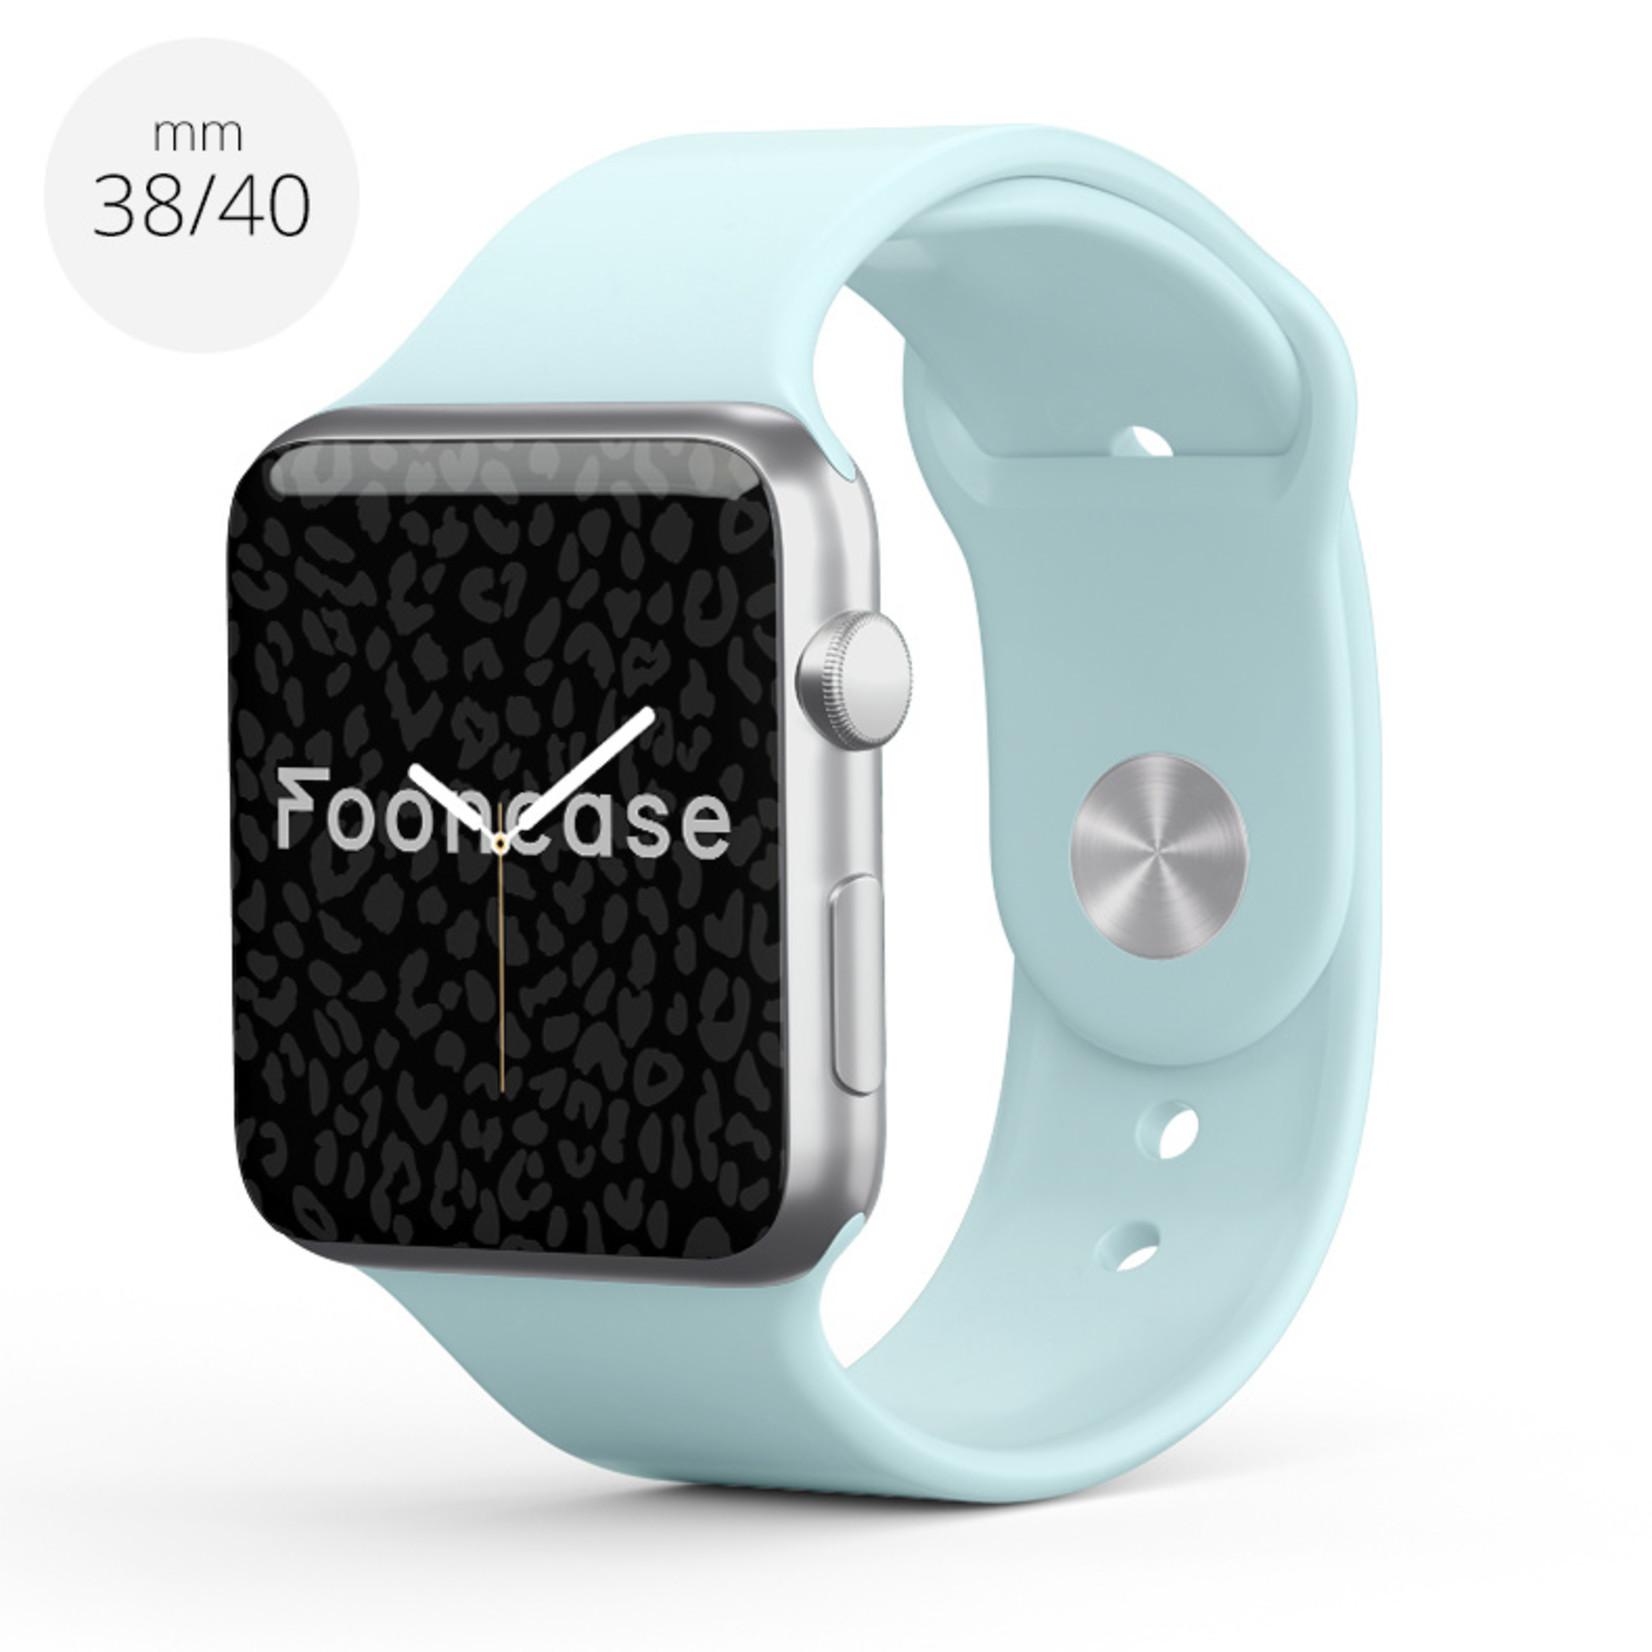 FOONCASE Apple Watch Series (1 t/m 6 / SE) - Minze - 38/40mm